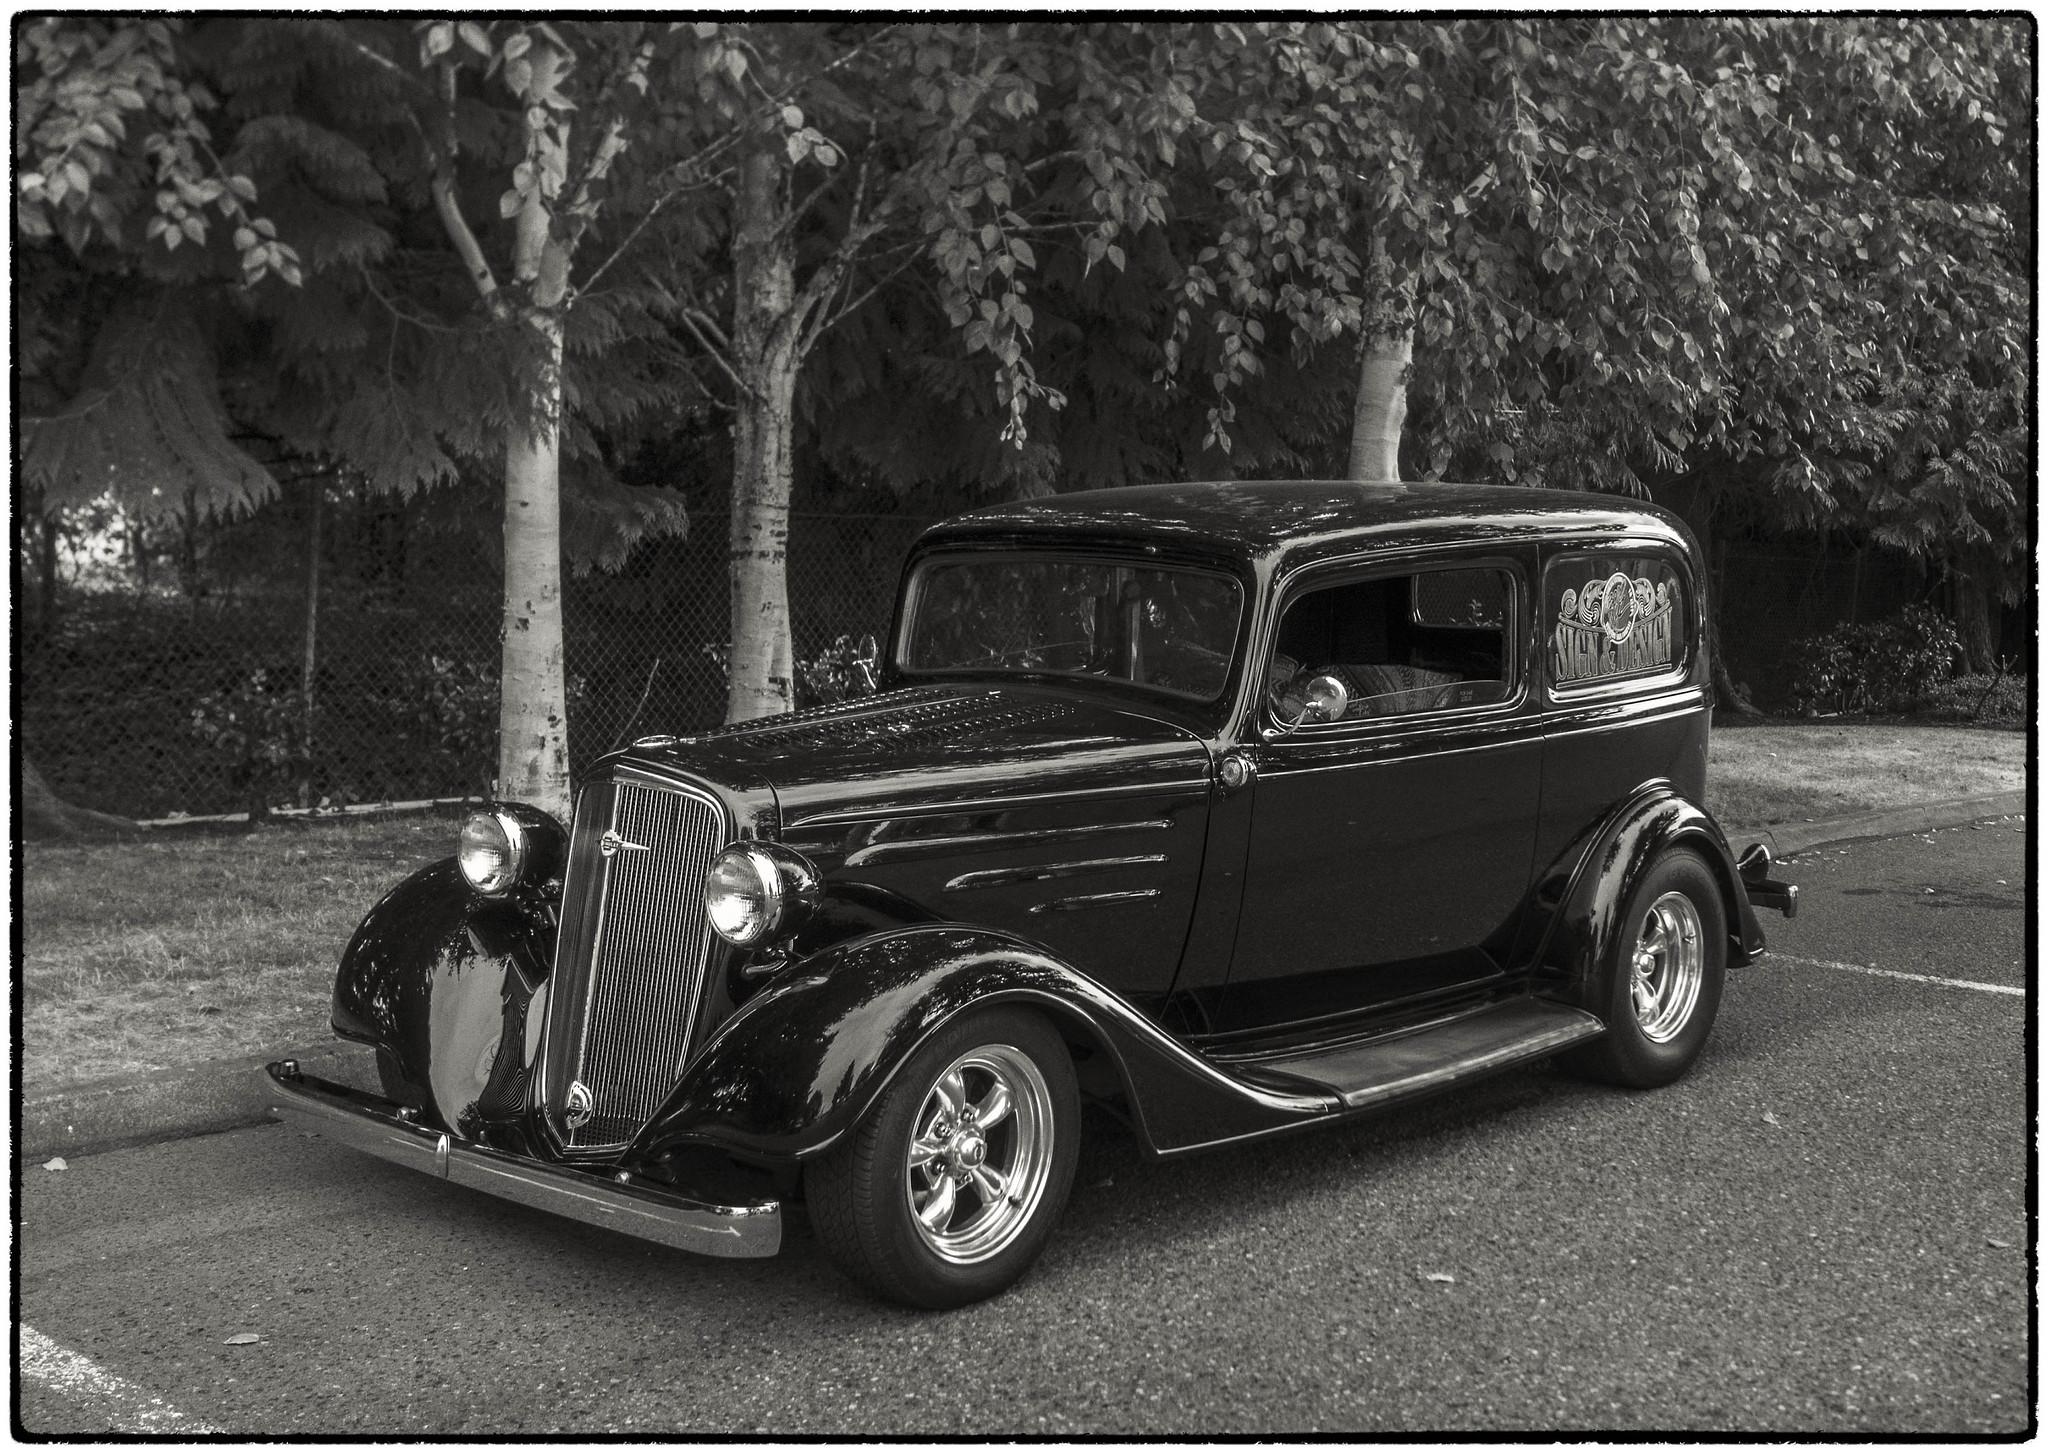 1933 chevy 2 door sedan flickr photo sharing for 1933 chevy 2 door sedan